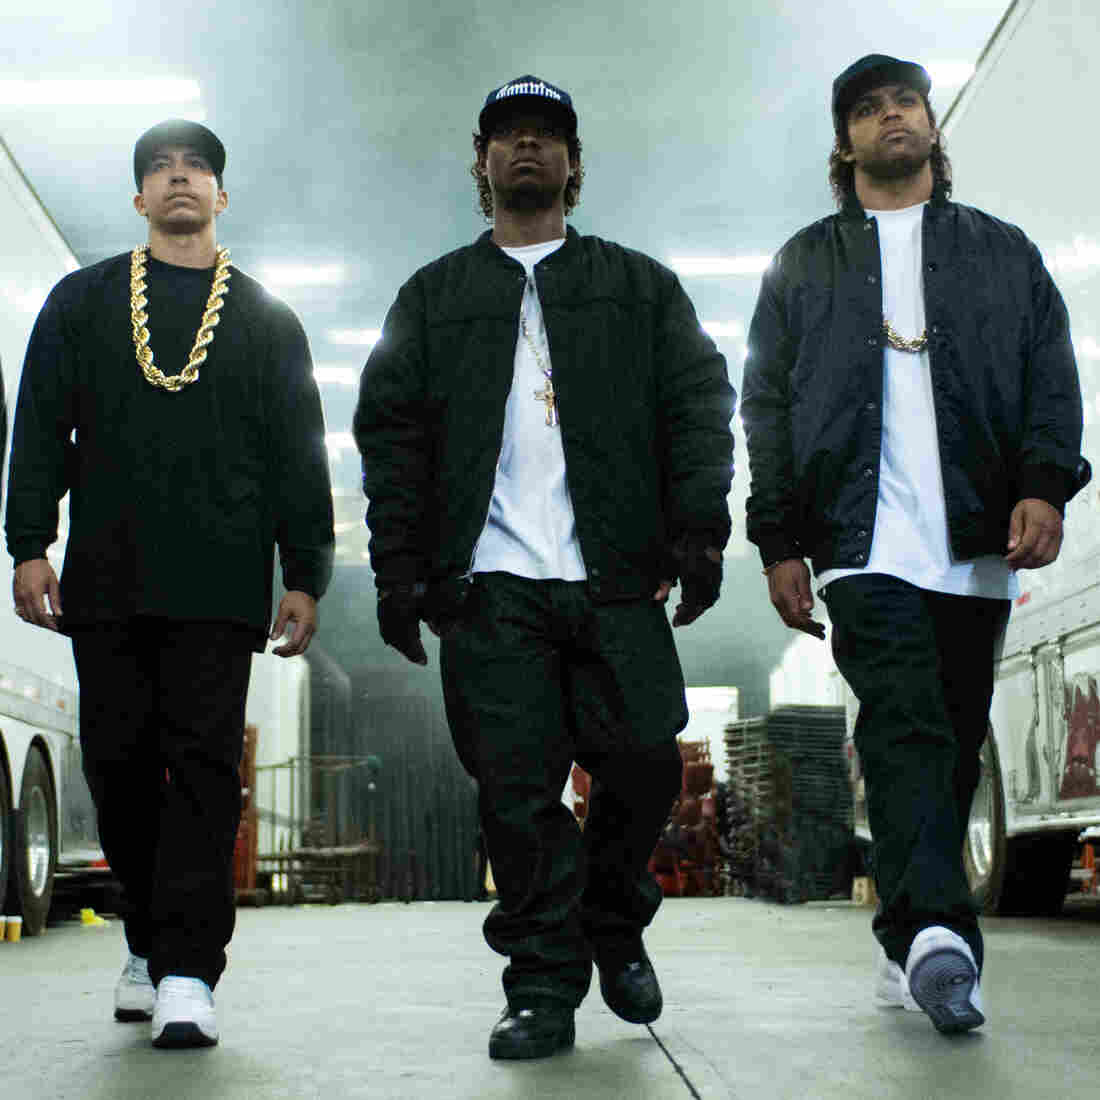 MC Ren (Aldis Hodge), DJ Yella (Neil Brown, Jr.), Eazy-E (Jason Mitchell), Ice Cube (O'Shea Jackson Jr.) and Dr. Dre (Corey Hawkins) form the NWA hip hop group in Straight Outta Compton.